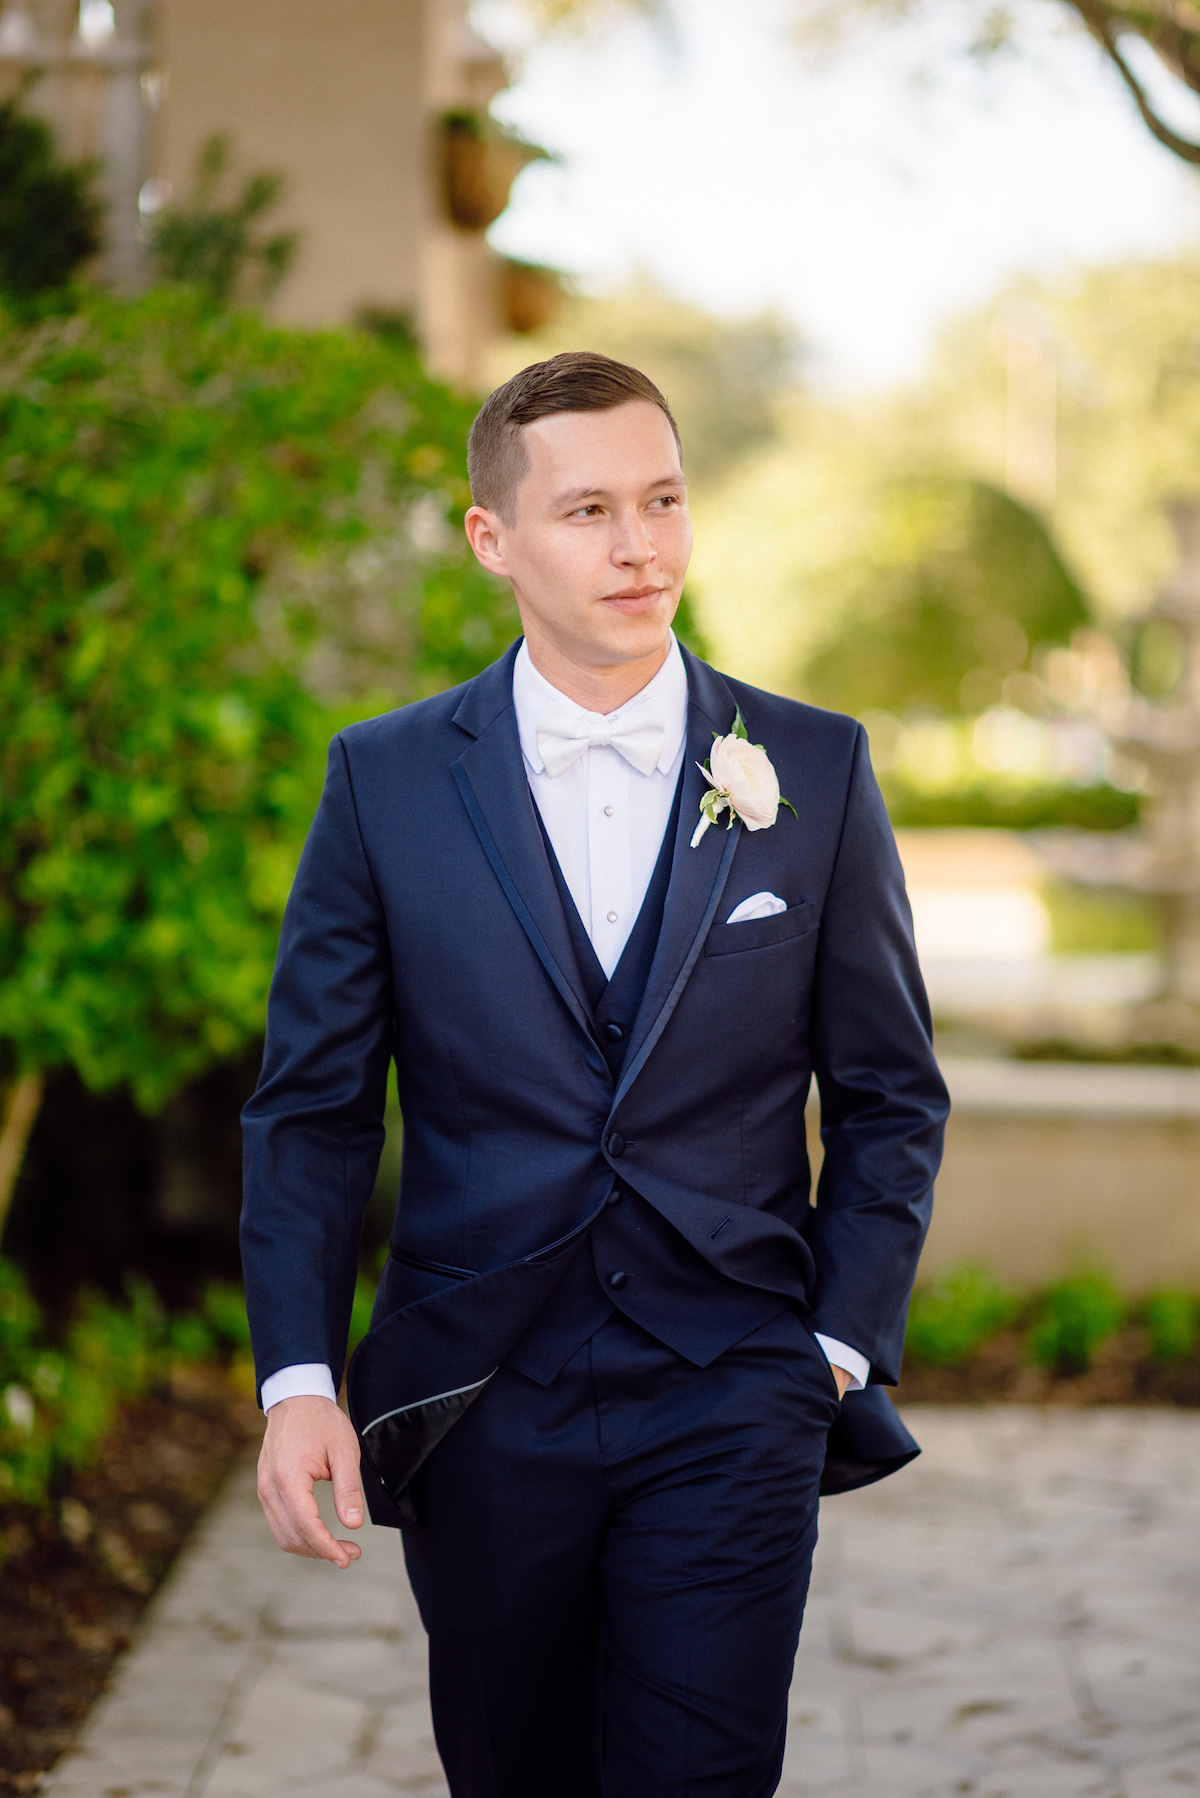 Weddings by Matt Steeves Photography Groom Portrait.jpg